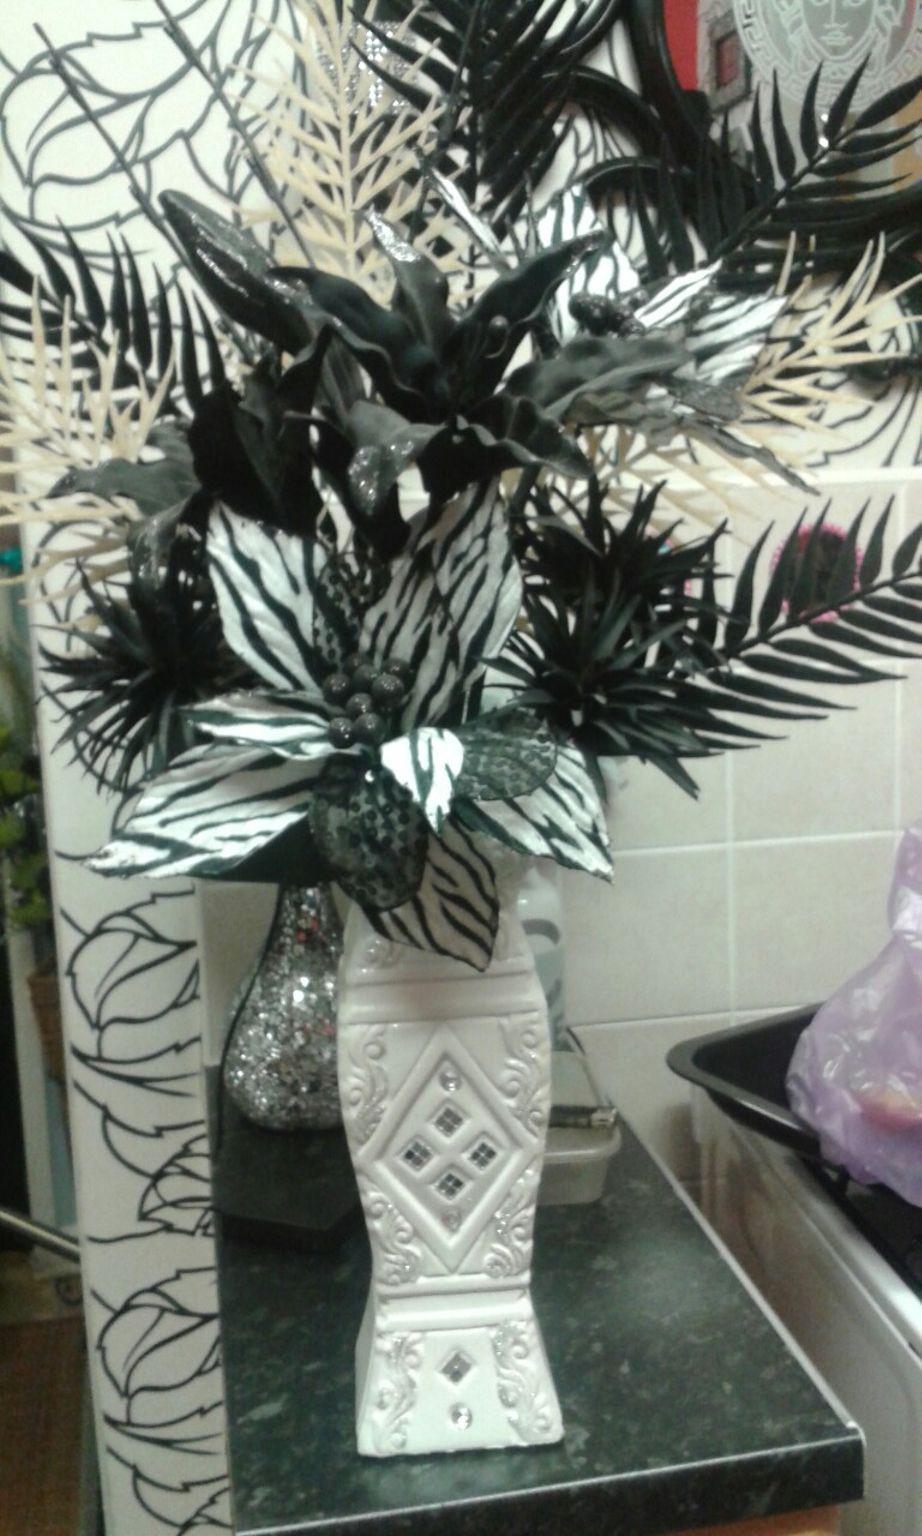 isle of wight glass vase of https en shpock com i wsp8sebccdzdaok1 2018 04 04t001557 regarding flowers in vase with lights 615de0a8